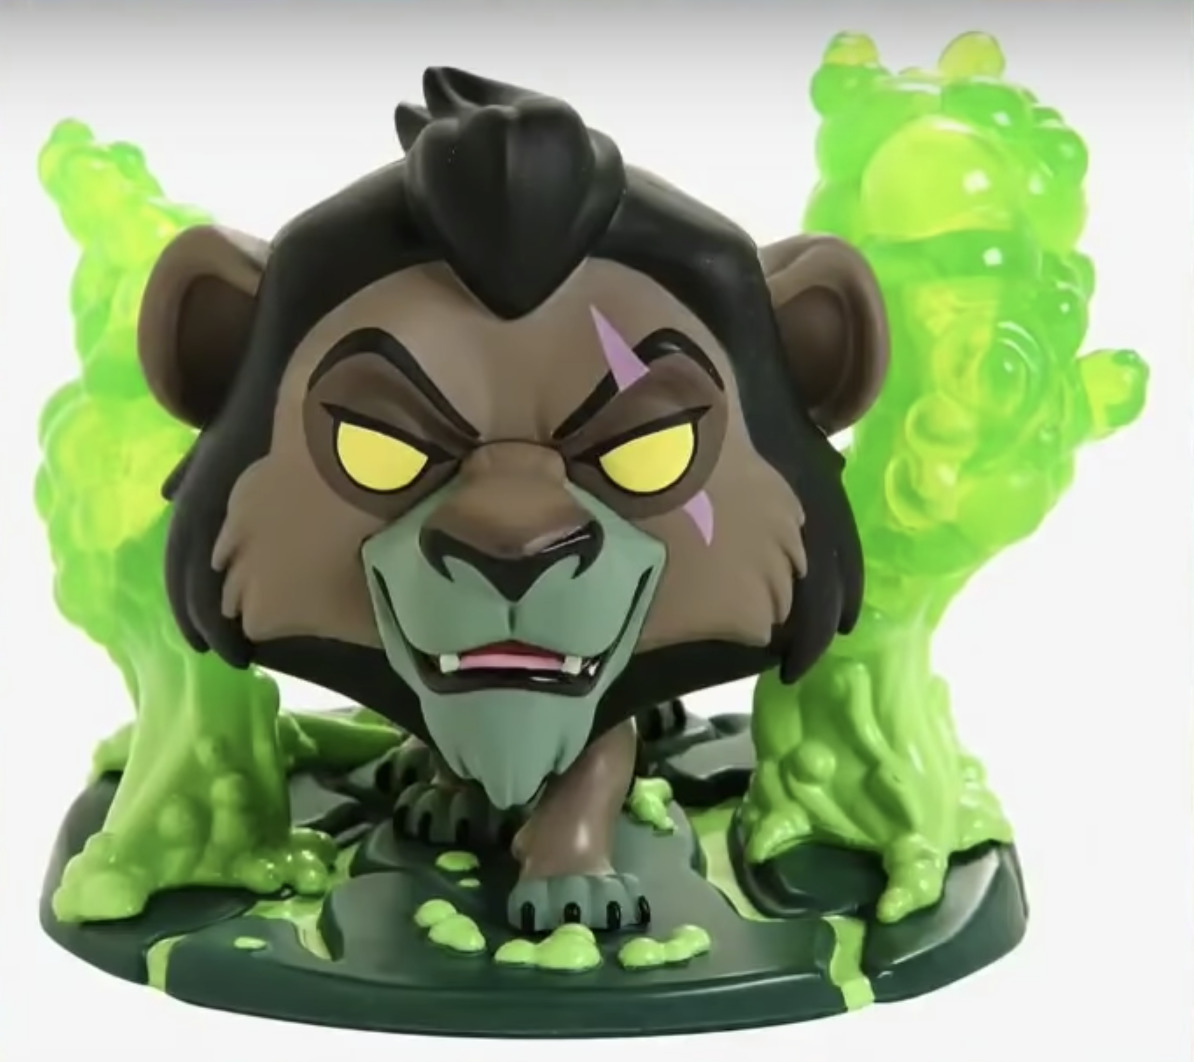 The Lion King - Disney Treasures Funko Gift Box image